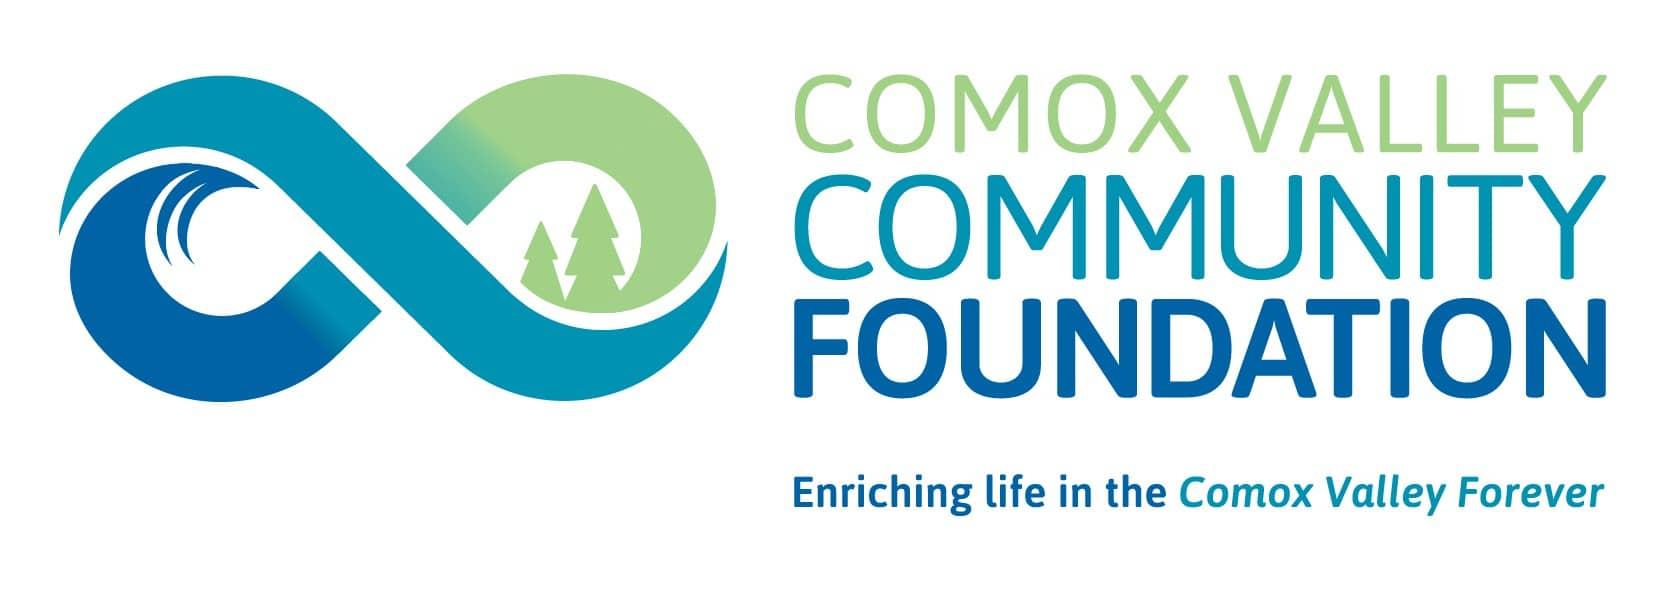 Comox Valley Community Foundation